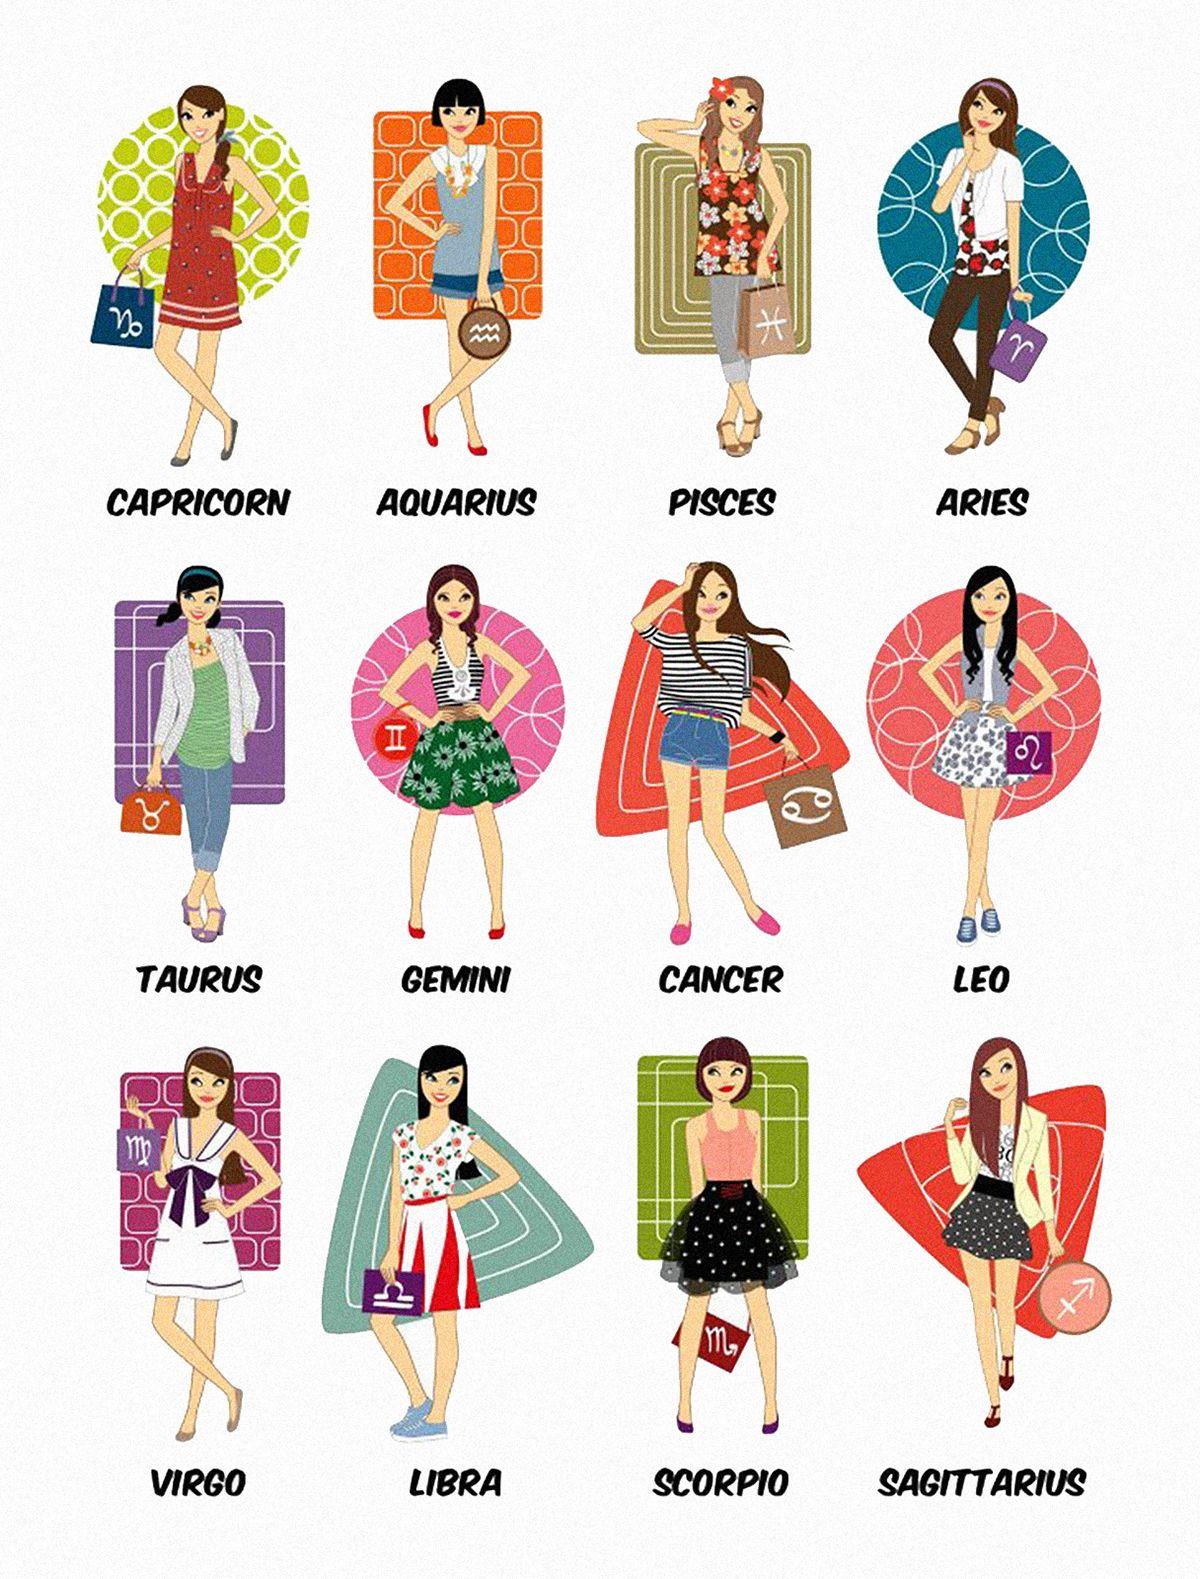 Zodiac Ladies Astrology Horoscope Zodiac Htttp Htttp Madamastrology